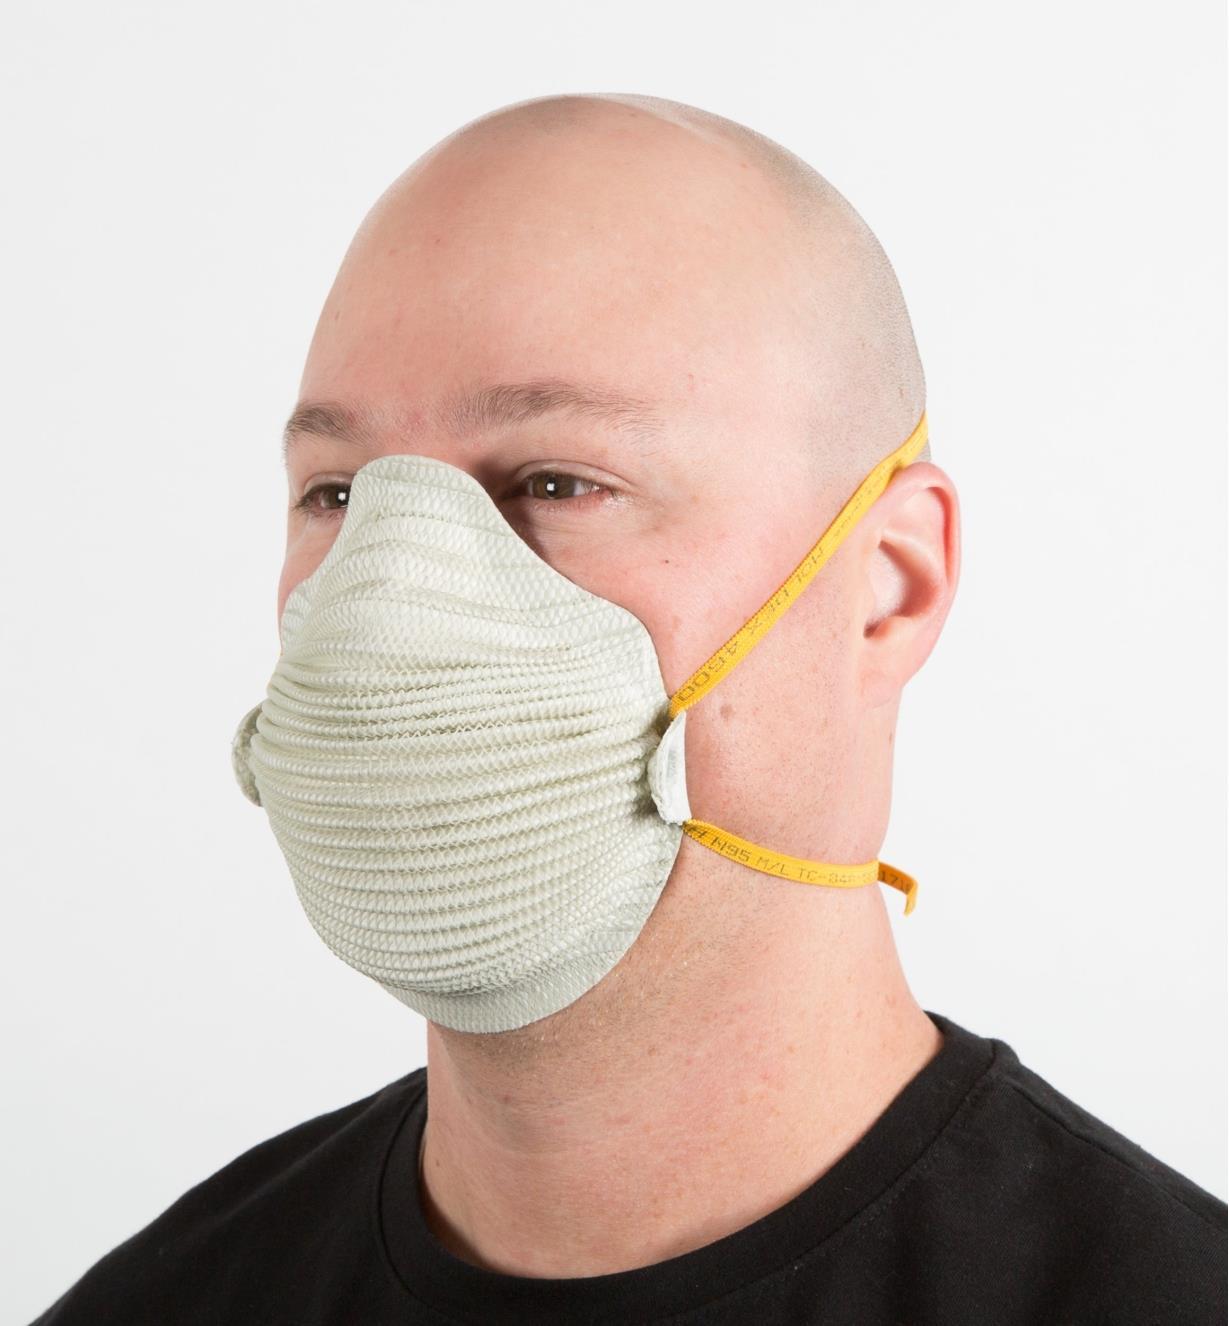 22R3610 - Airwave Adjustable-Strap Disposable Dust Masks, Medium/Large, pkg. of 10